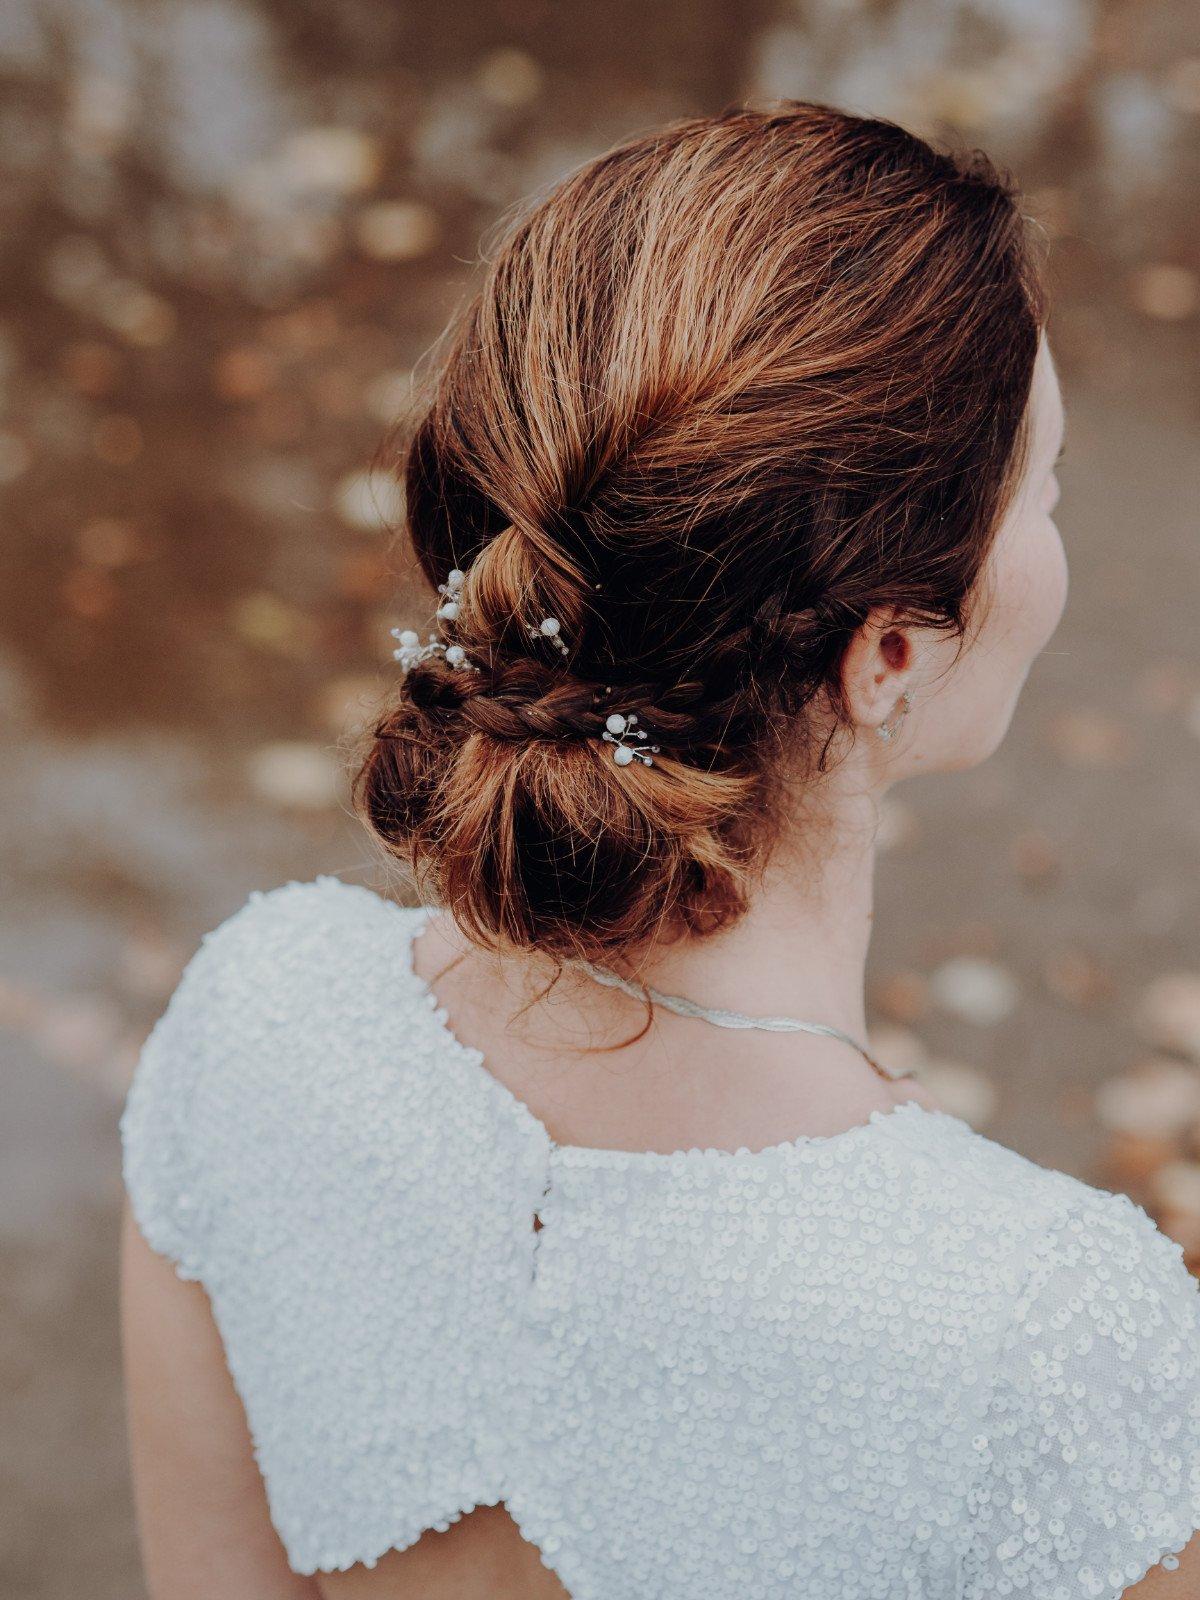 Kundin Tina mit Haarnadeln aus Perlen